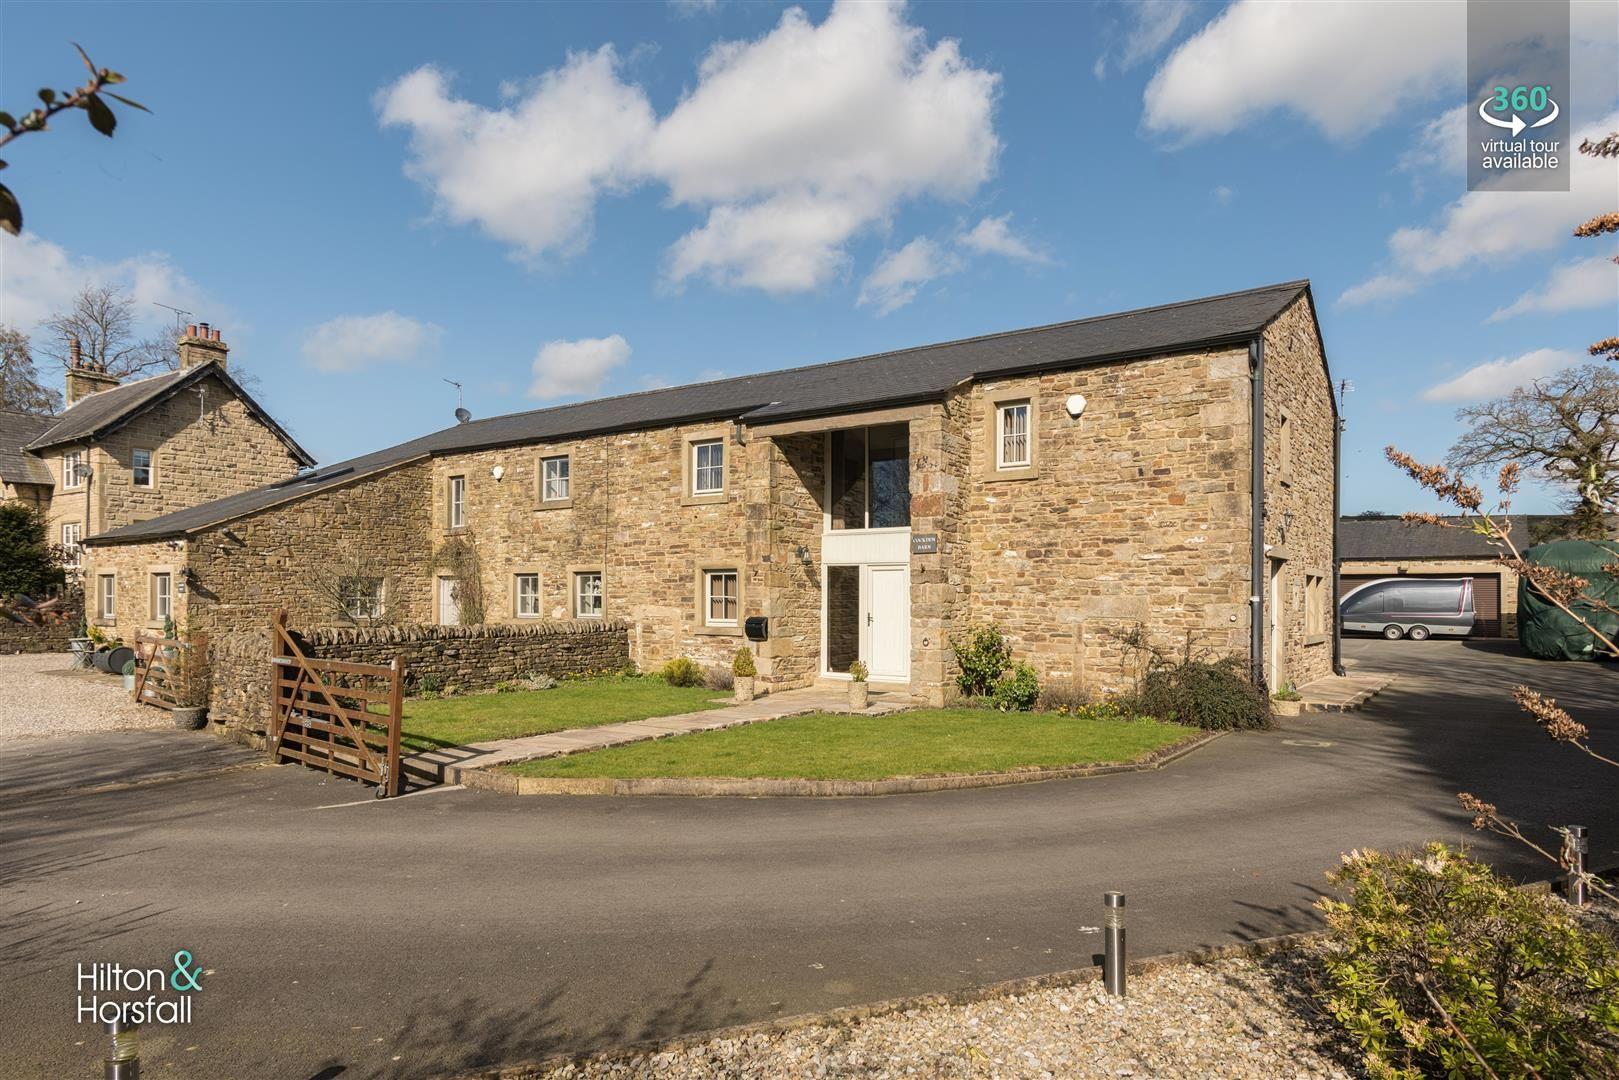 Property photo 1 of 26. Cockden Barn